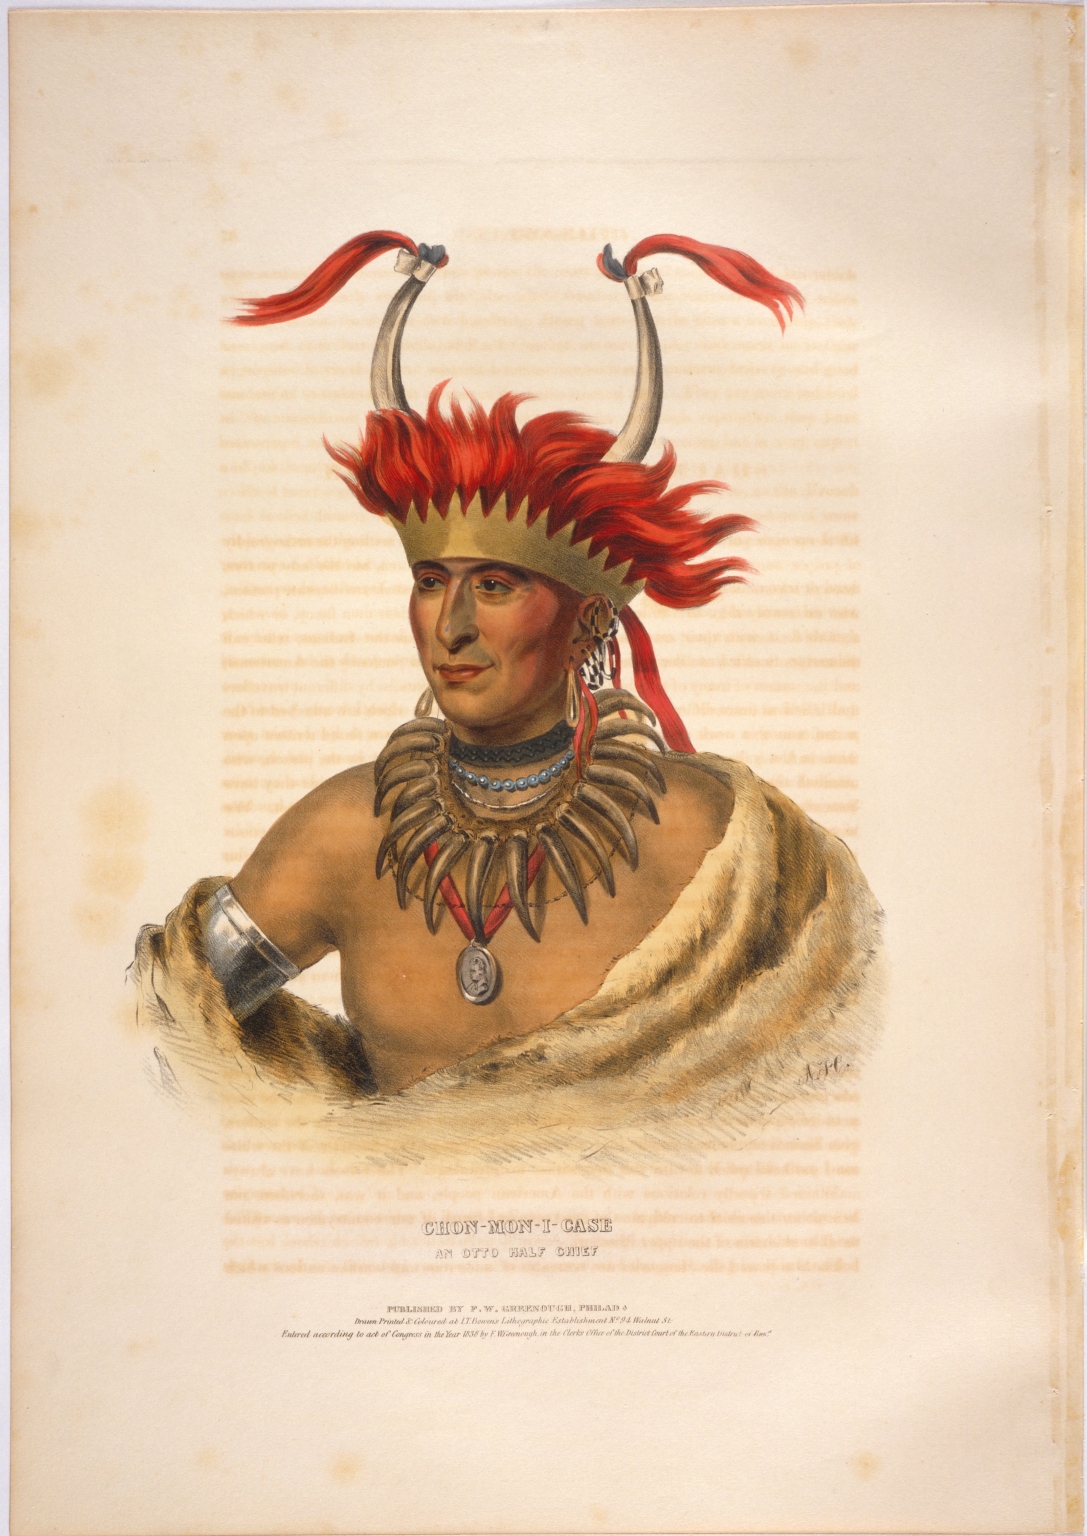 Chon-mon-i-case, an Otto half chief